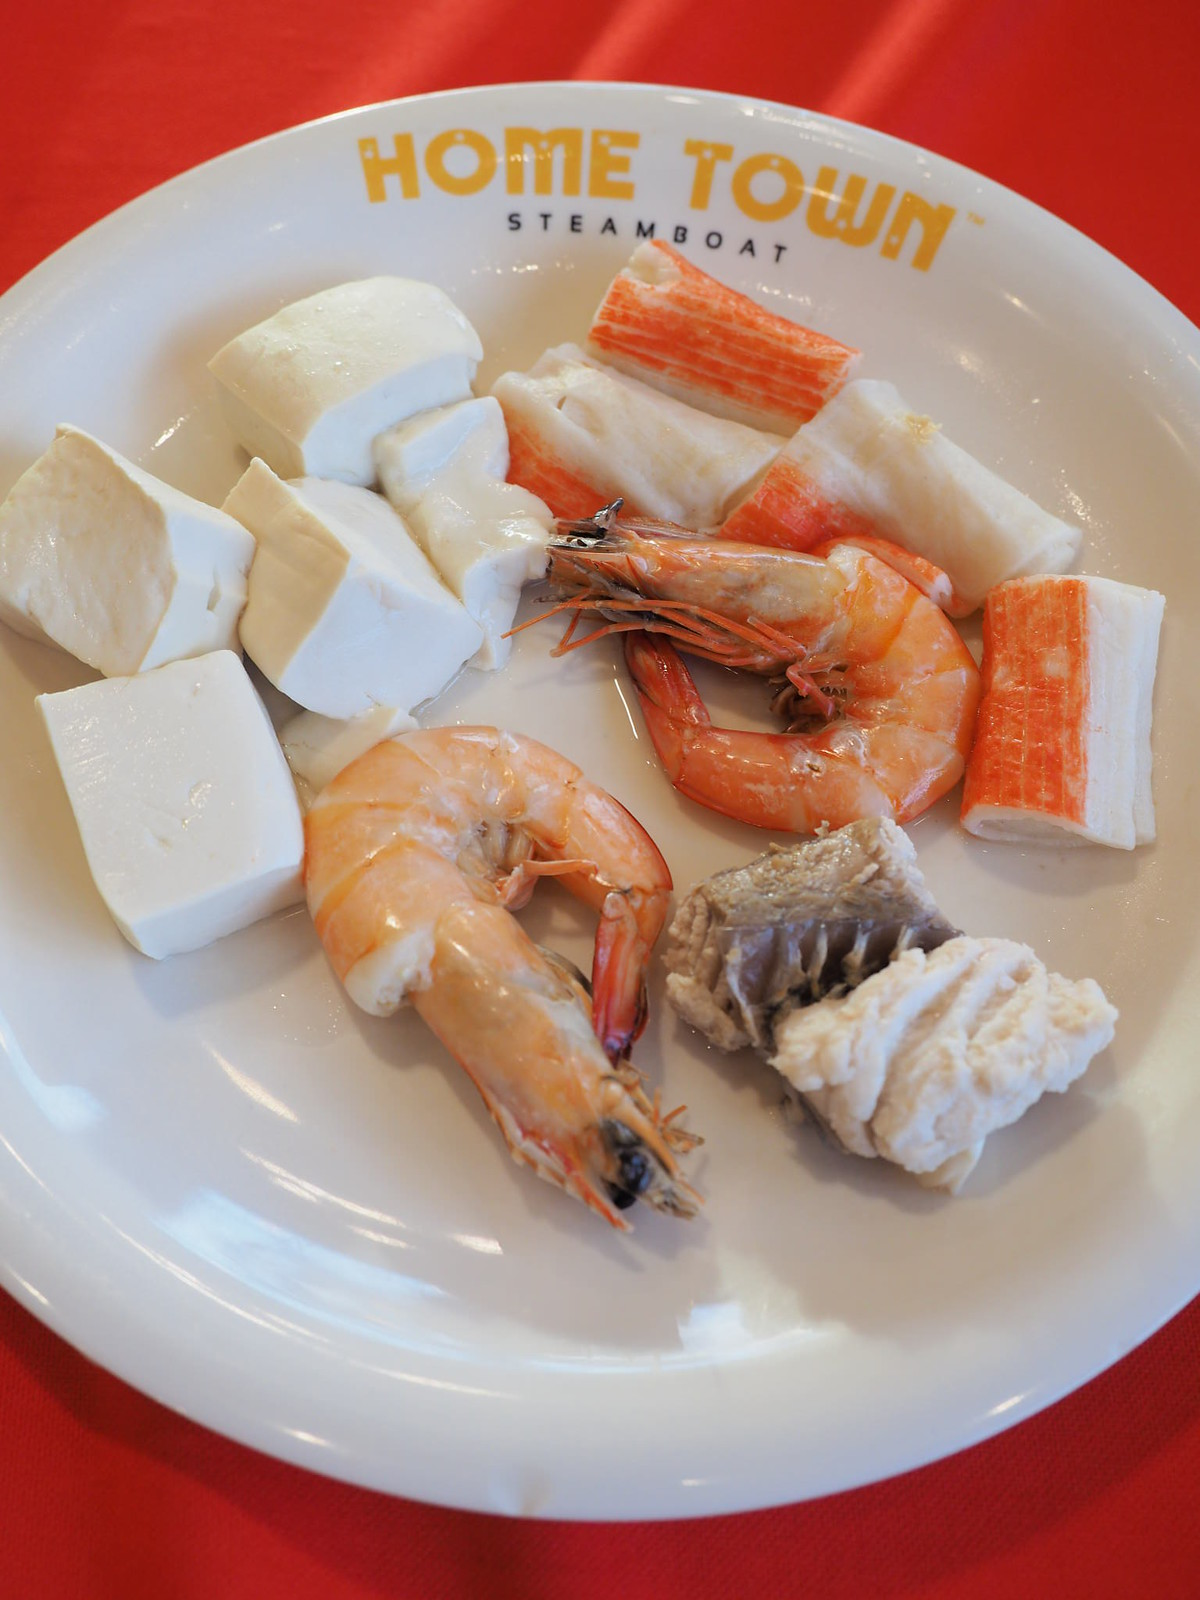 Tofu, prawns, fish and crab sticks